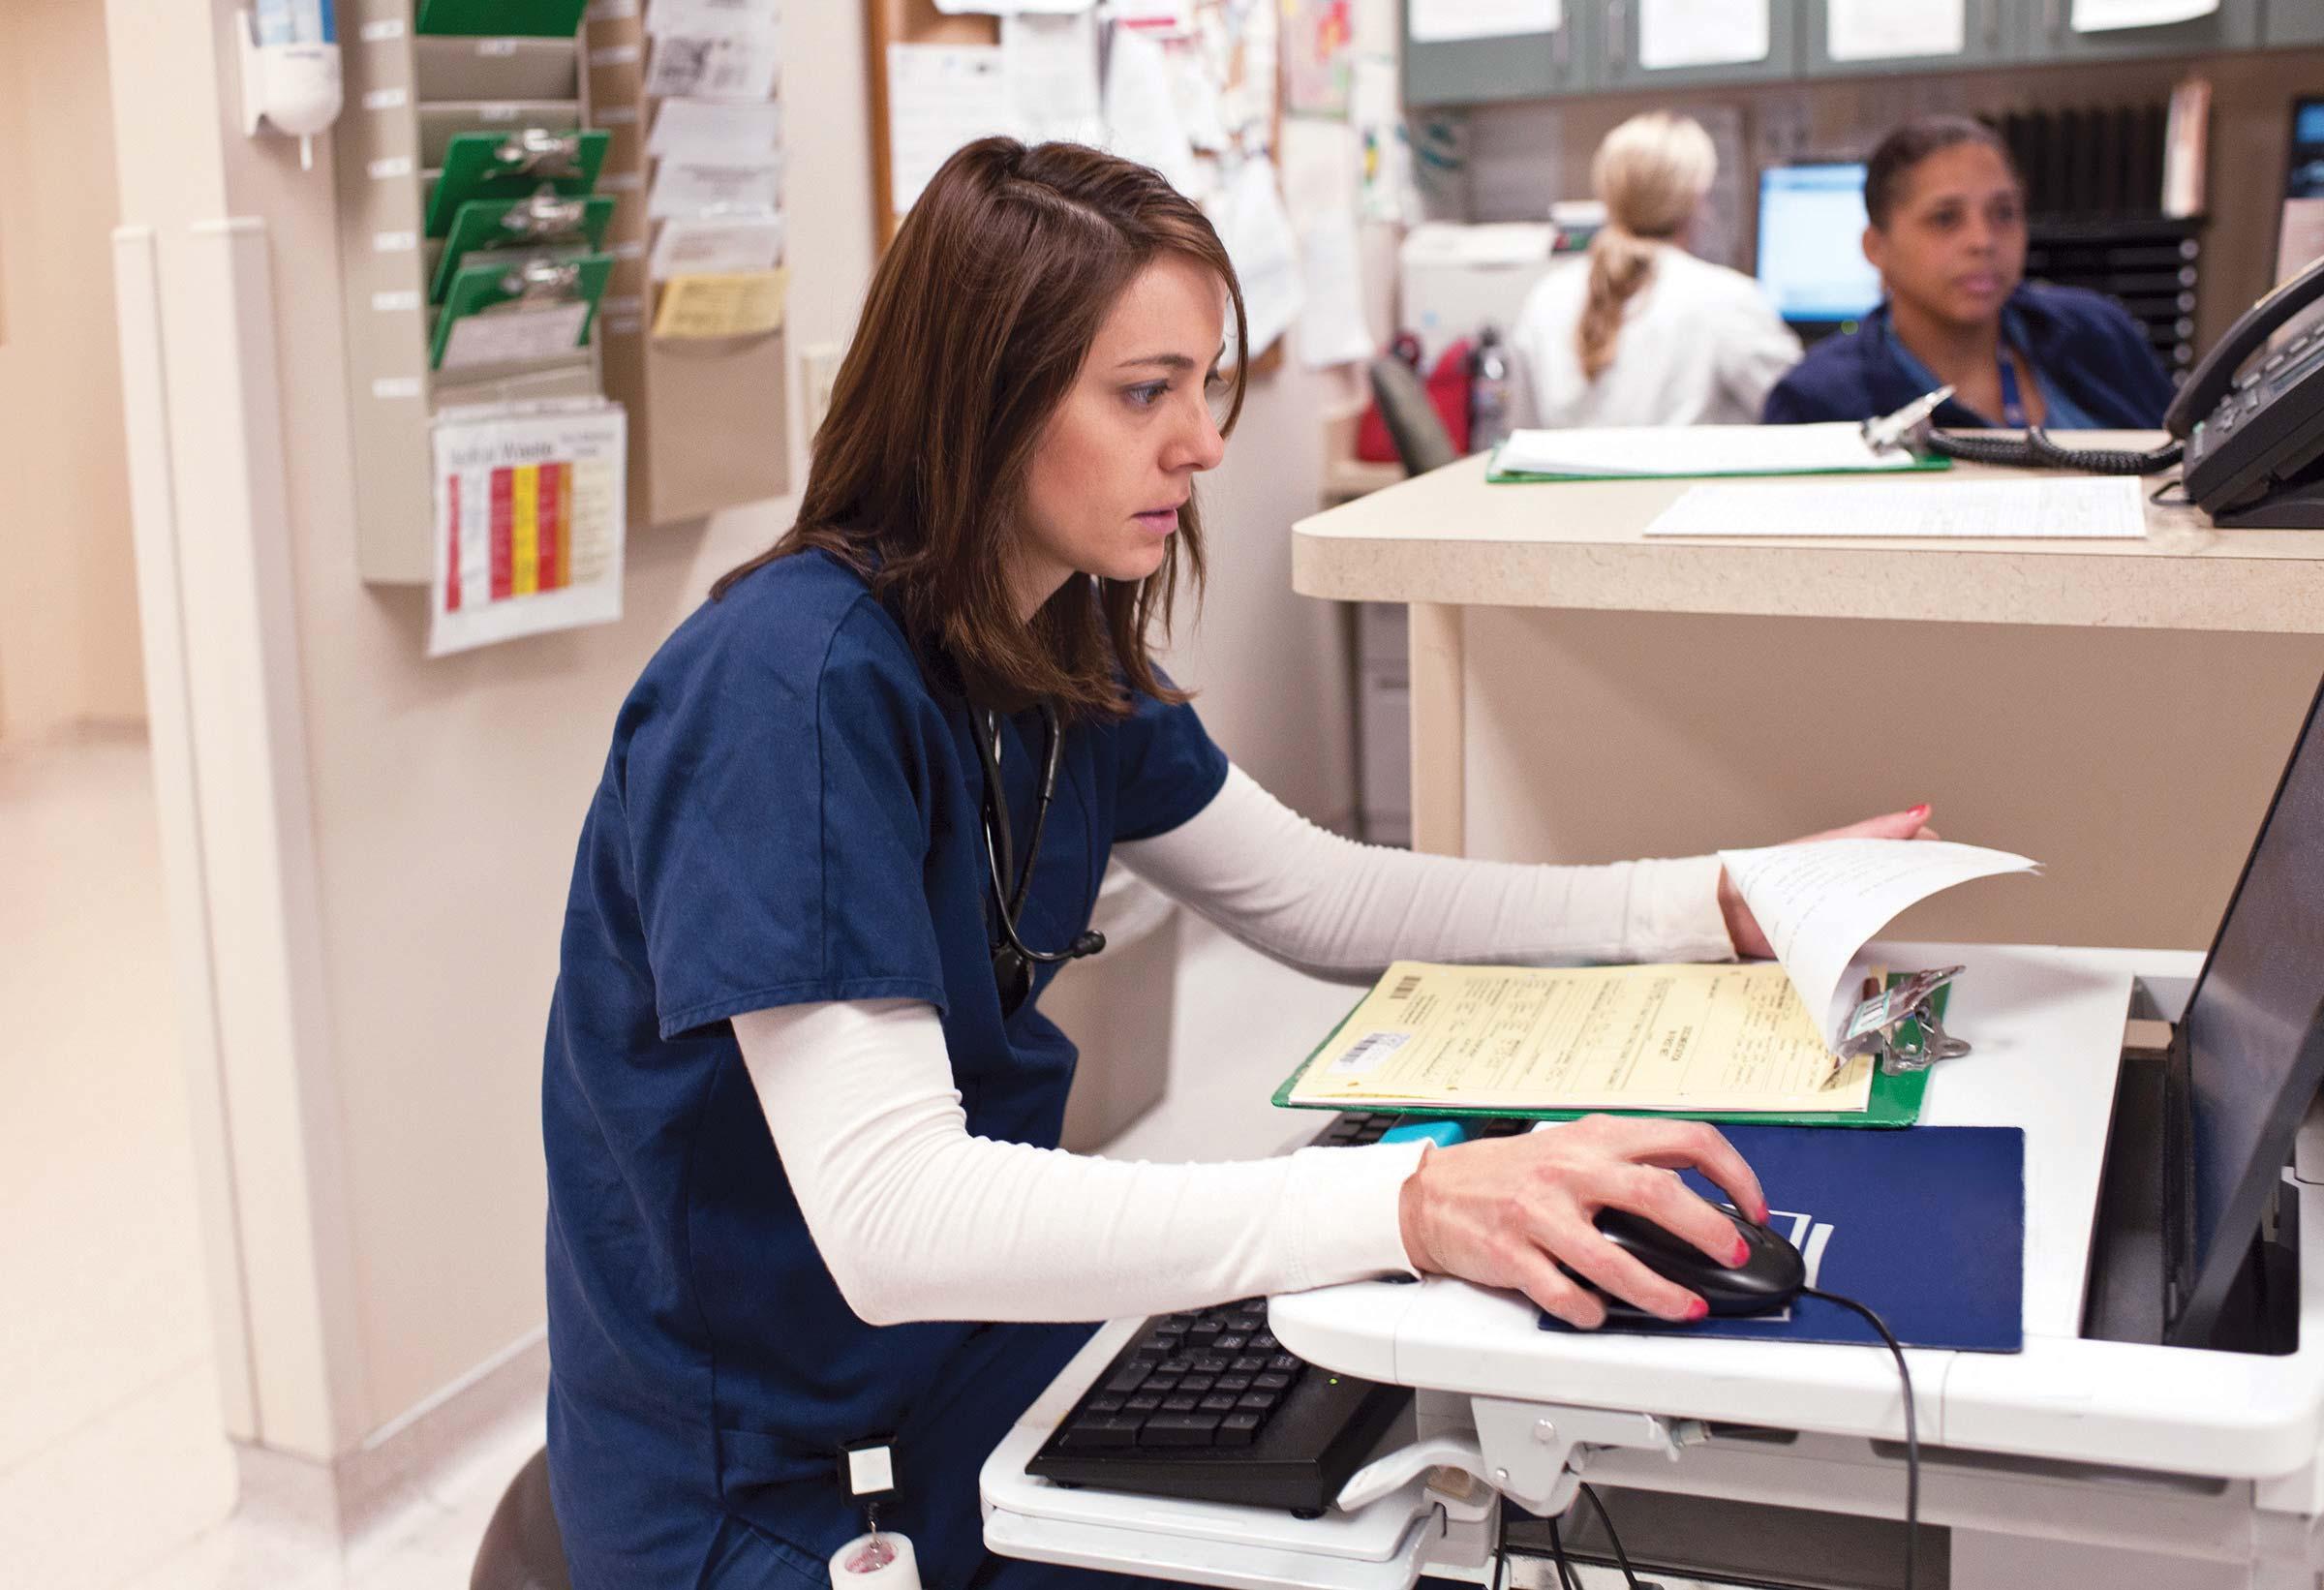 New York nurses to vote on strike authorization